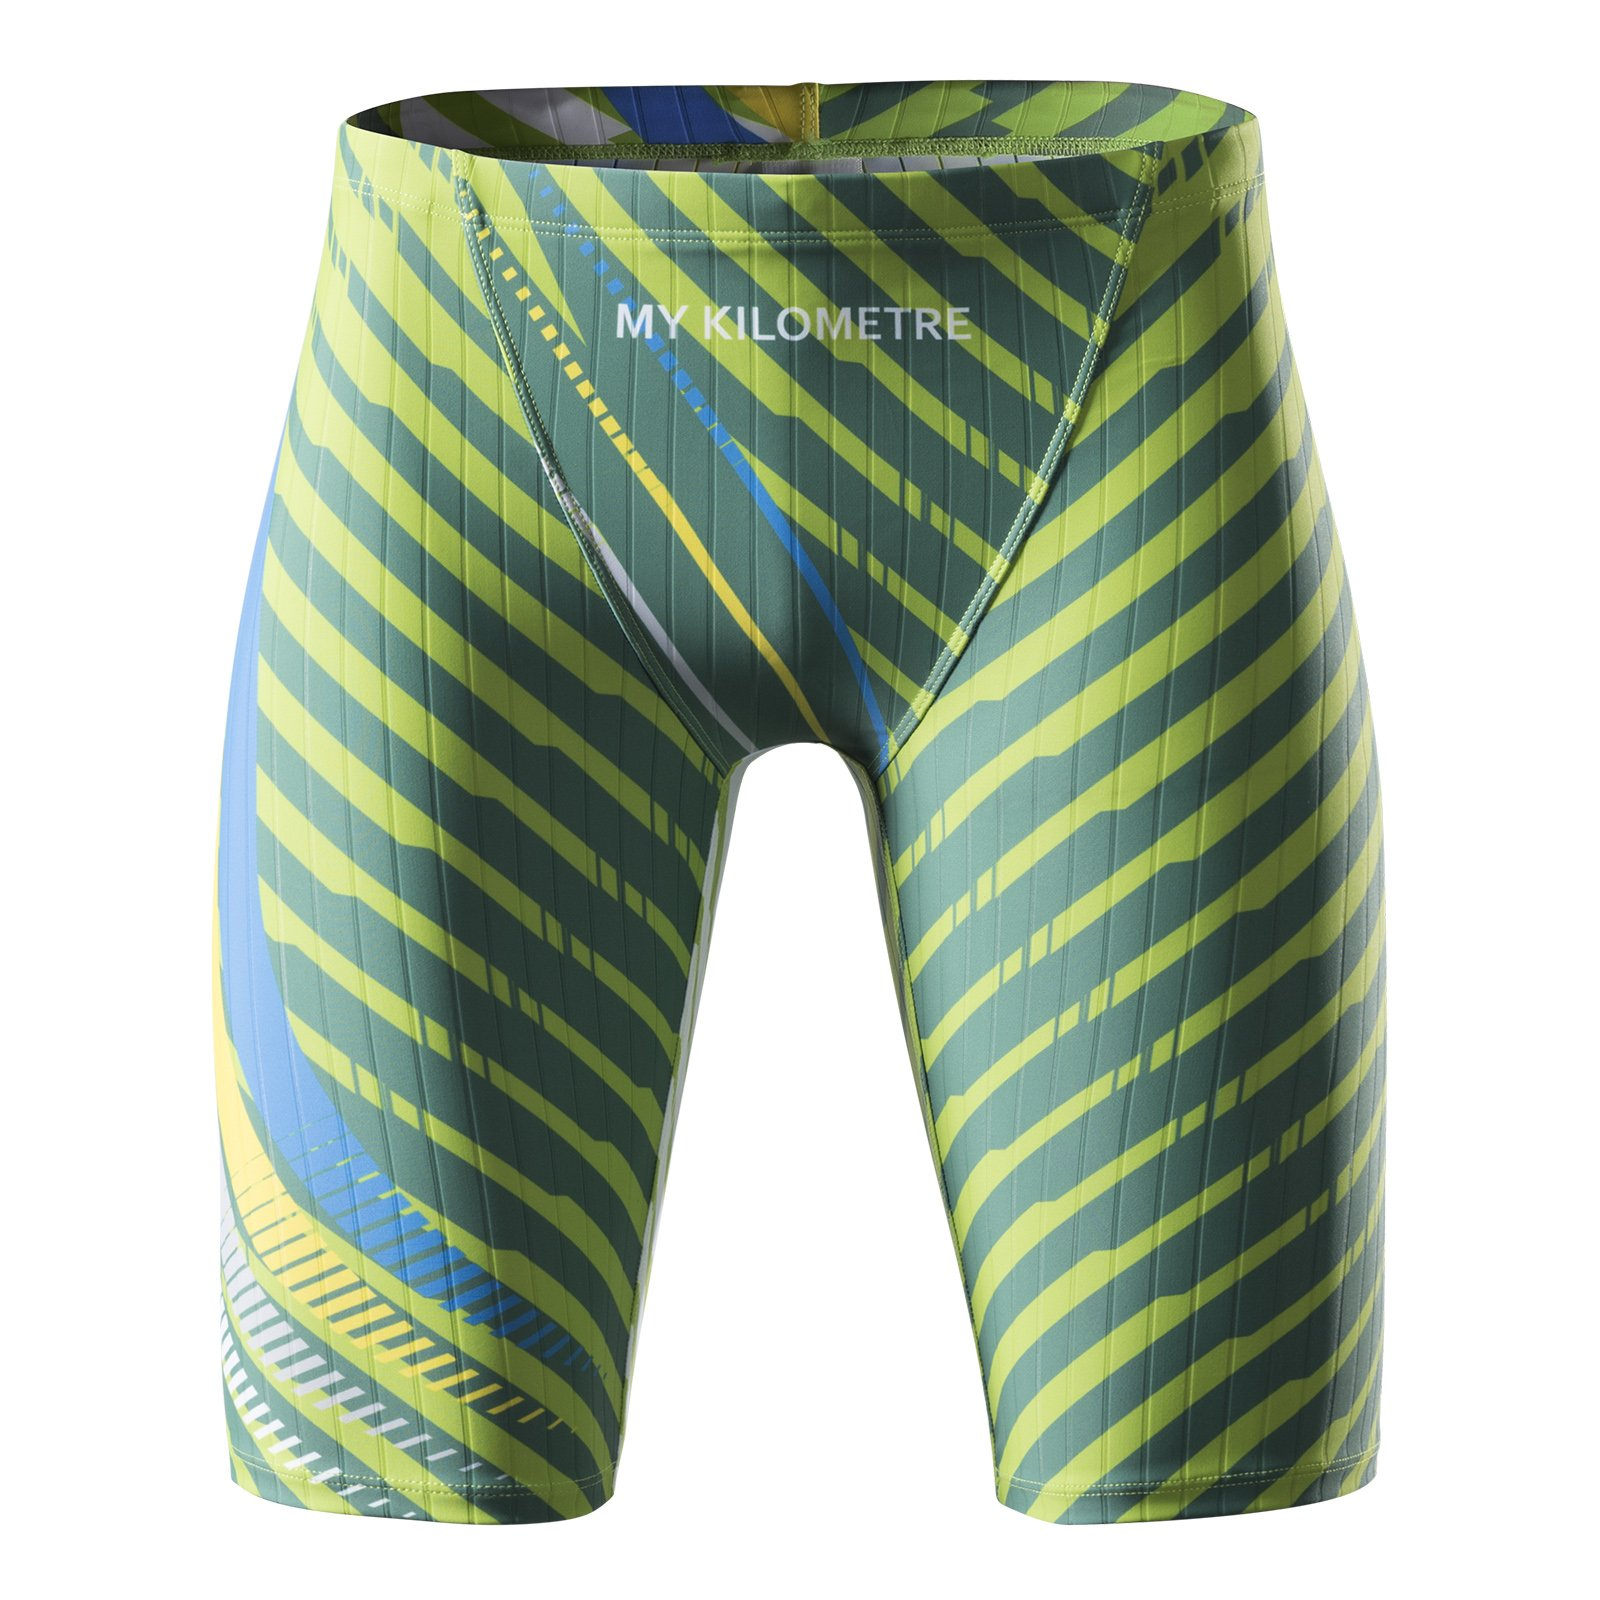 MY KILOMETRE Jammer Swimsuit Mens Solid Swim Jammers Endurance Long Racing Training Swimsuit Swim-01